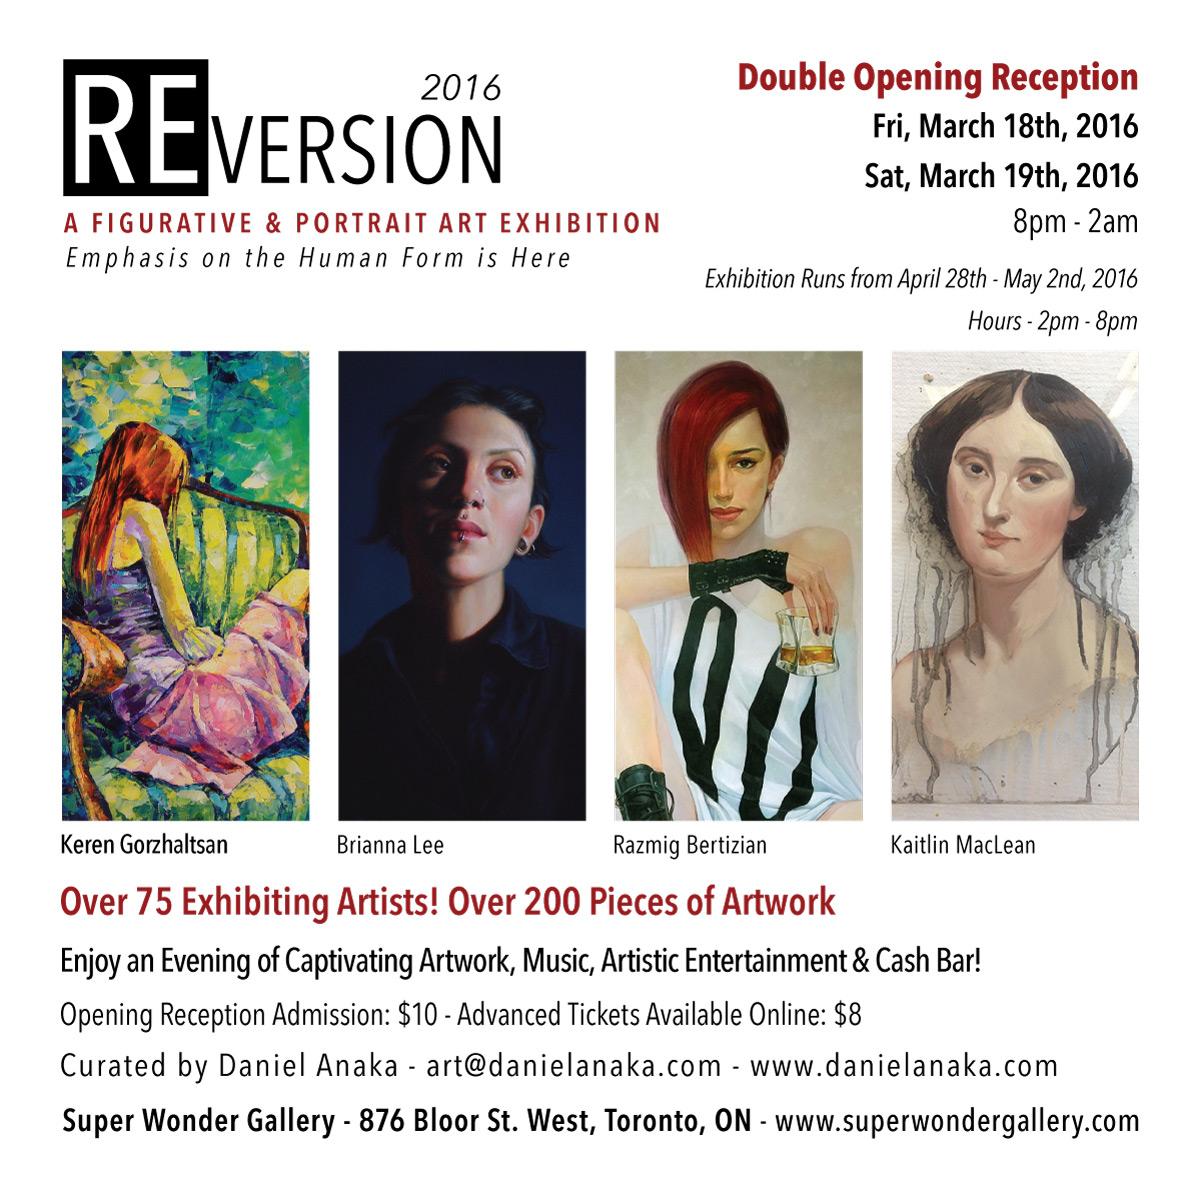 Reversion-2016-Figurative-Portrait-Art-Exhibtion-Toronto